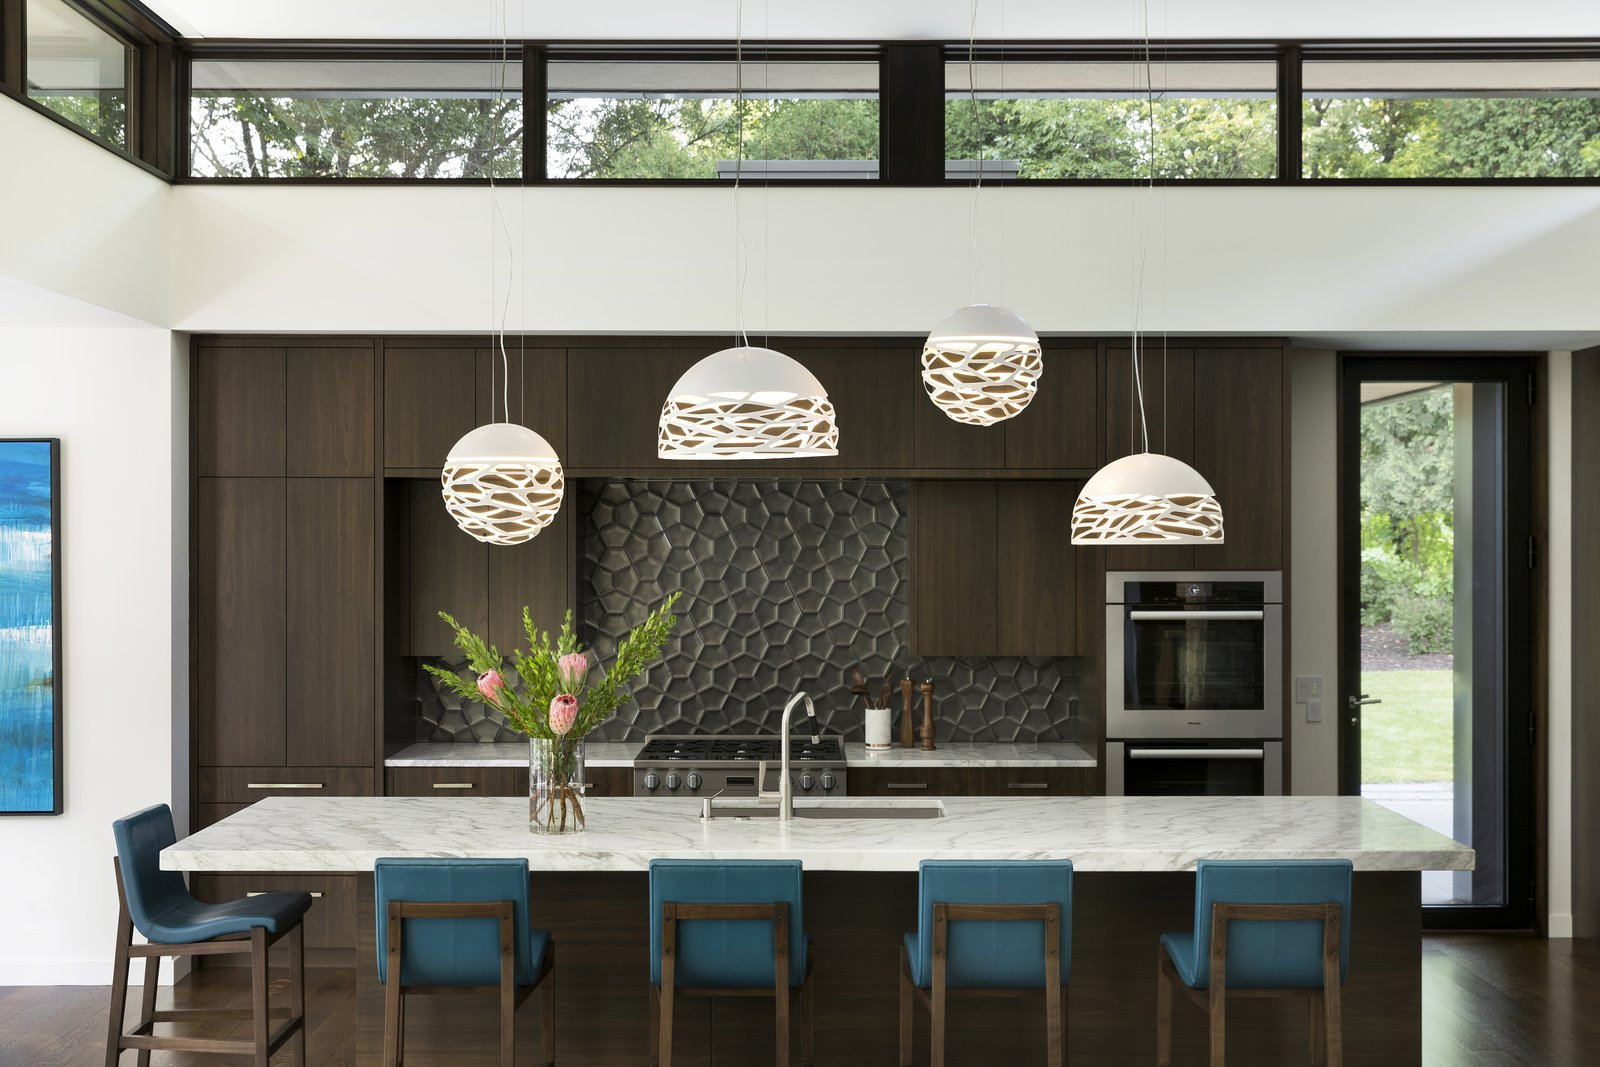 Kitchen, Wall Oven, Cooktops, Engineered Quartz, Medium Hardwood, Ceramic Tile, Mosaic Tile, Pendant, and Undermount  Kitchen Cooktops Undermount Wall Oven Ceramic Tile Engineered Quartz Photos from Sunfish Lake Residence